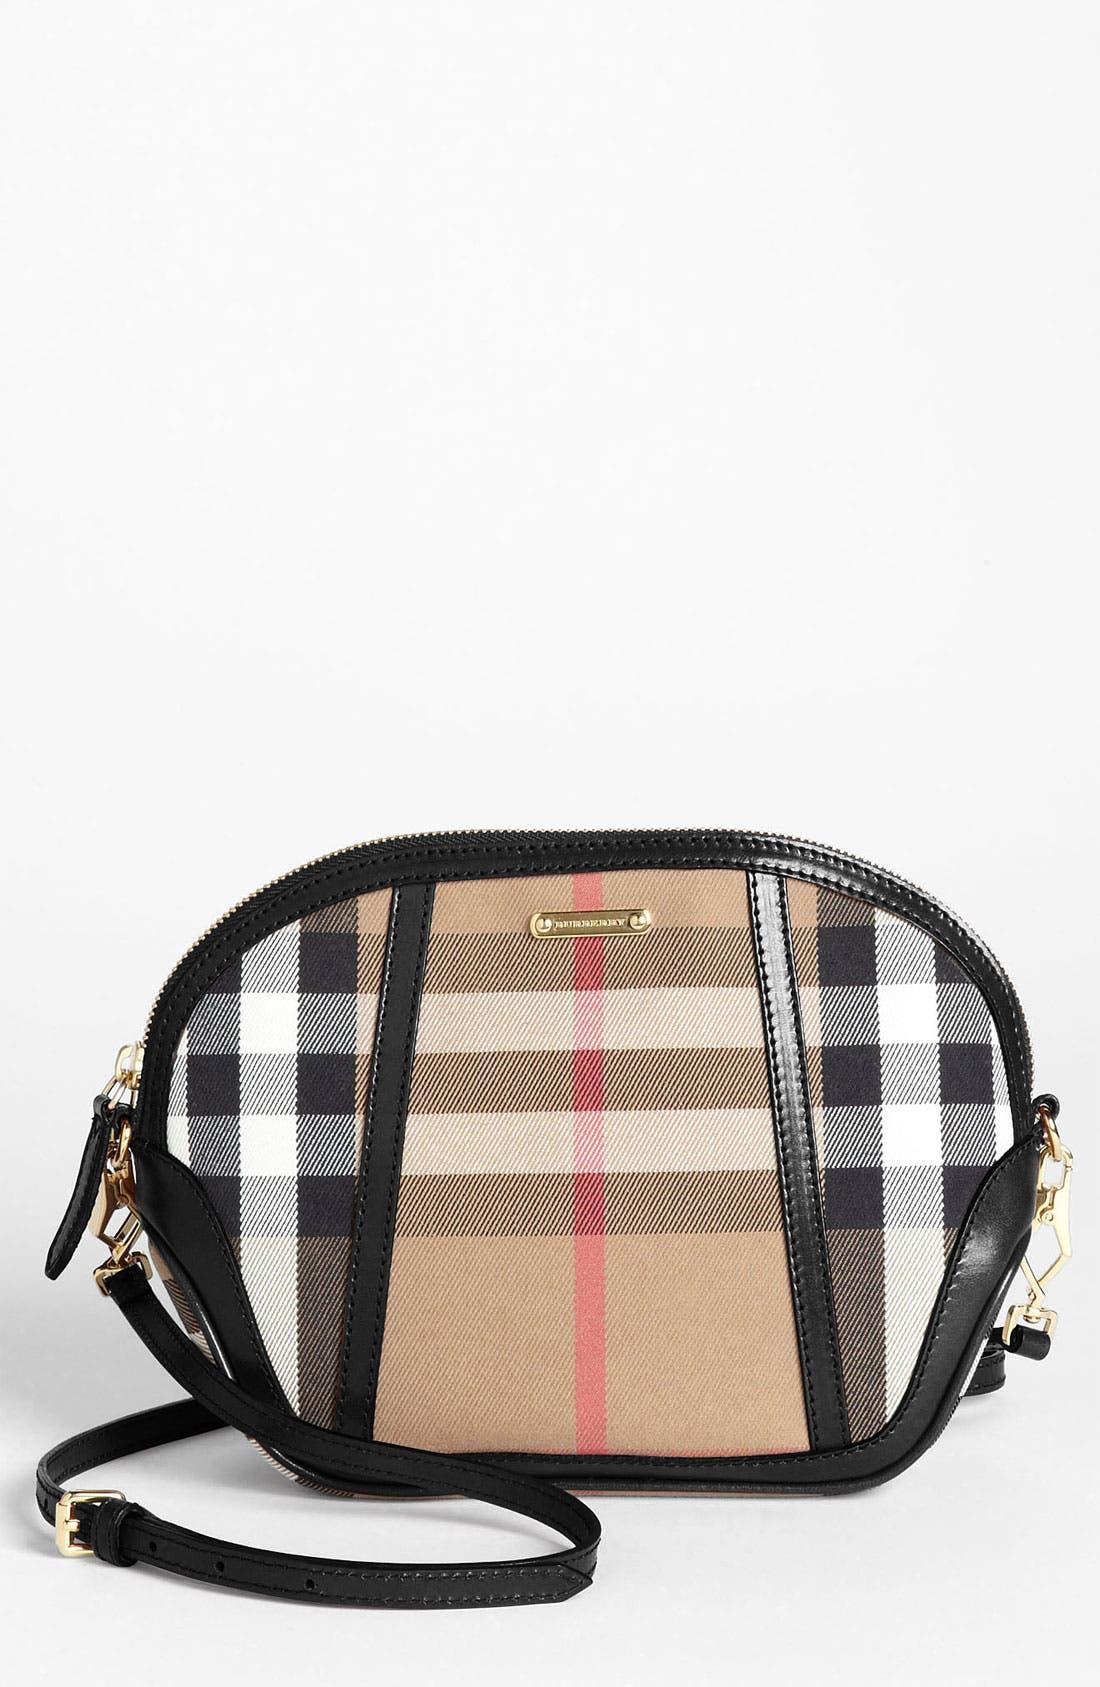 Alternate Image 1 Selected - Burberry 'House Check' Crossbody Bag, Small